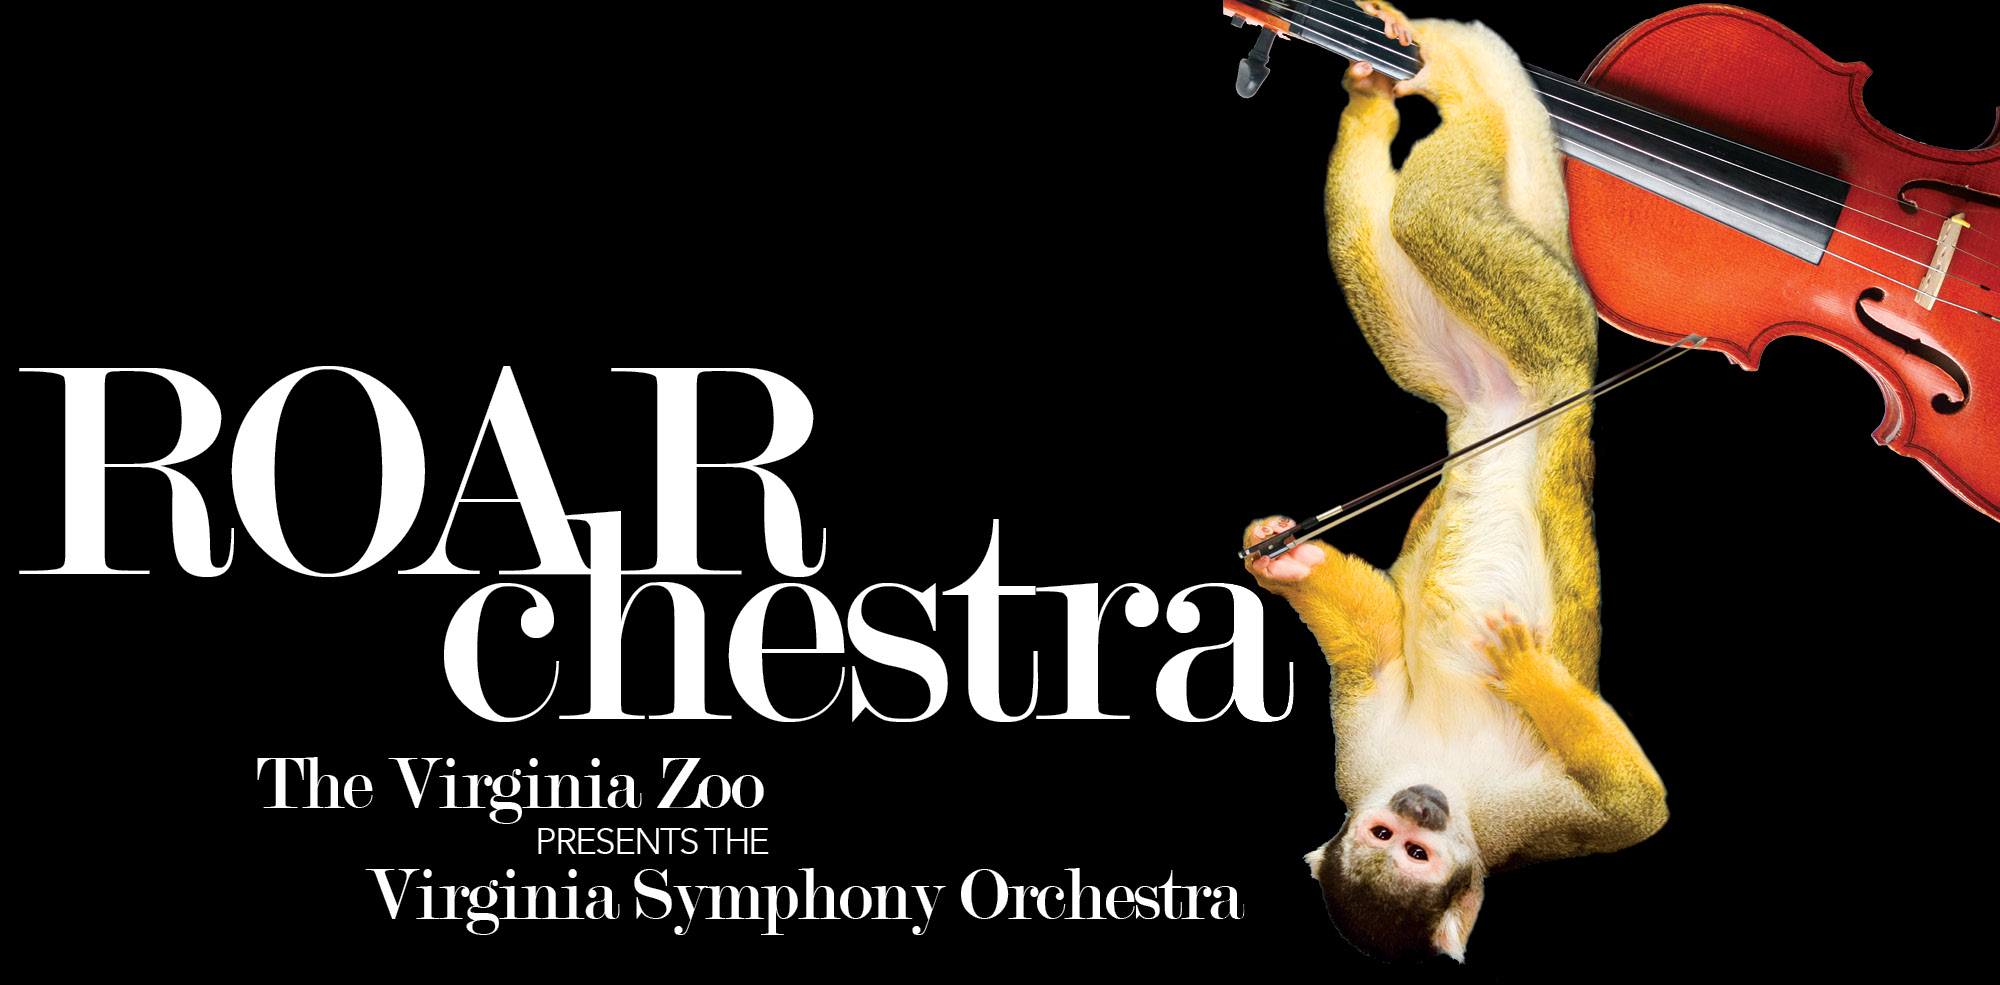 VAZOO_ROARchestra 2015_website slider